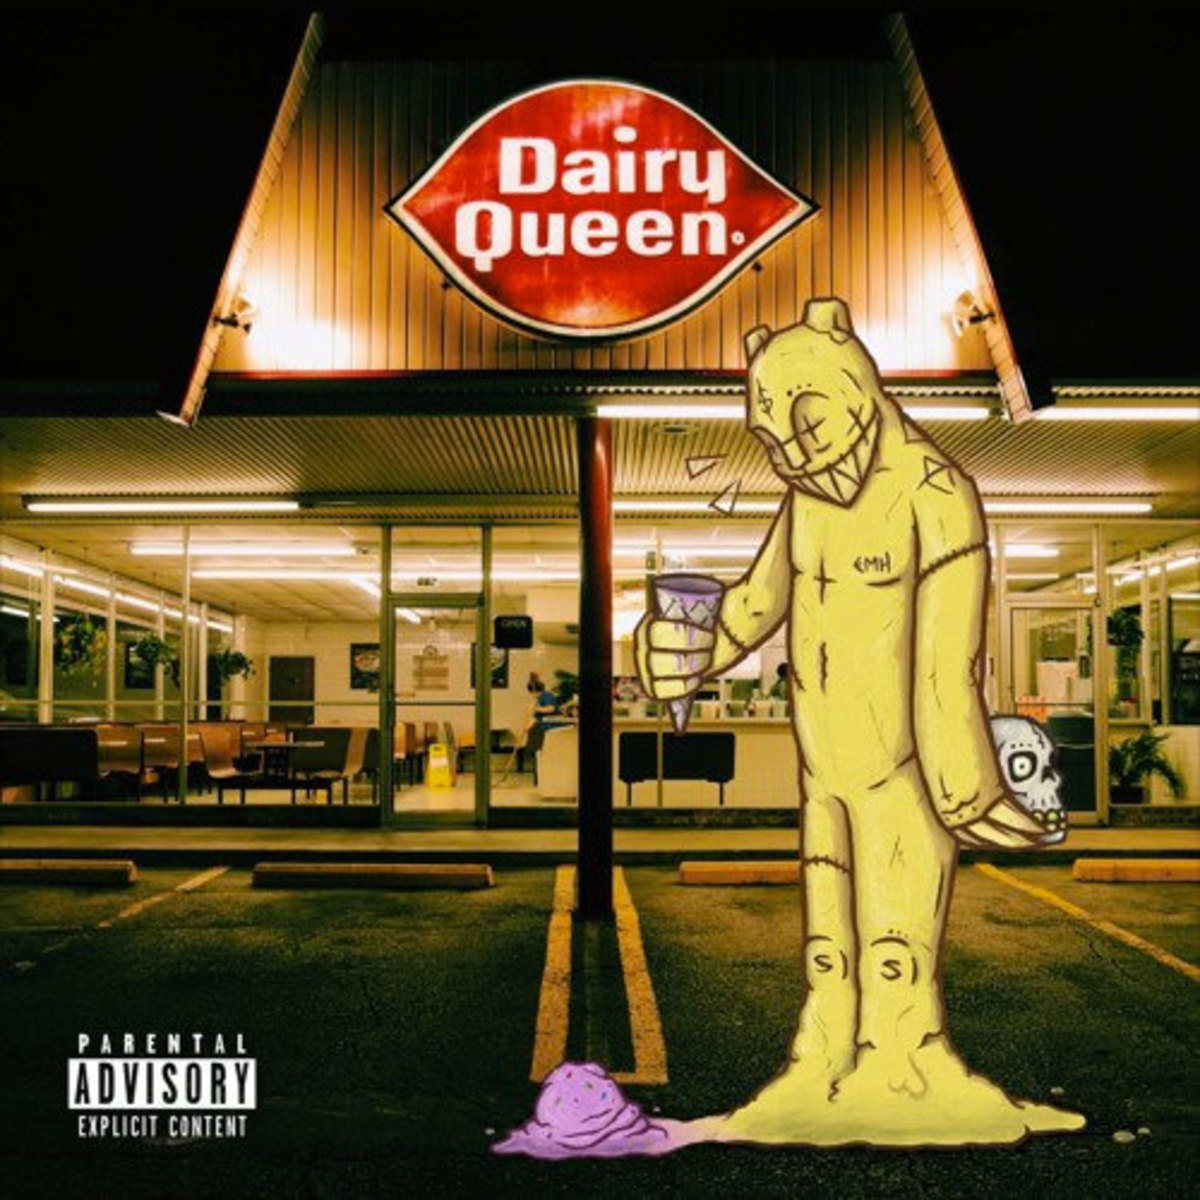 garrett-merkin-dairy-queen.jpg